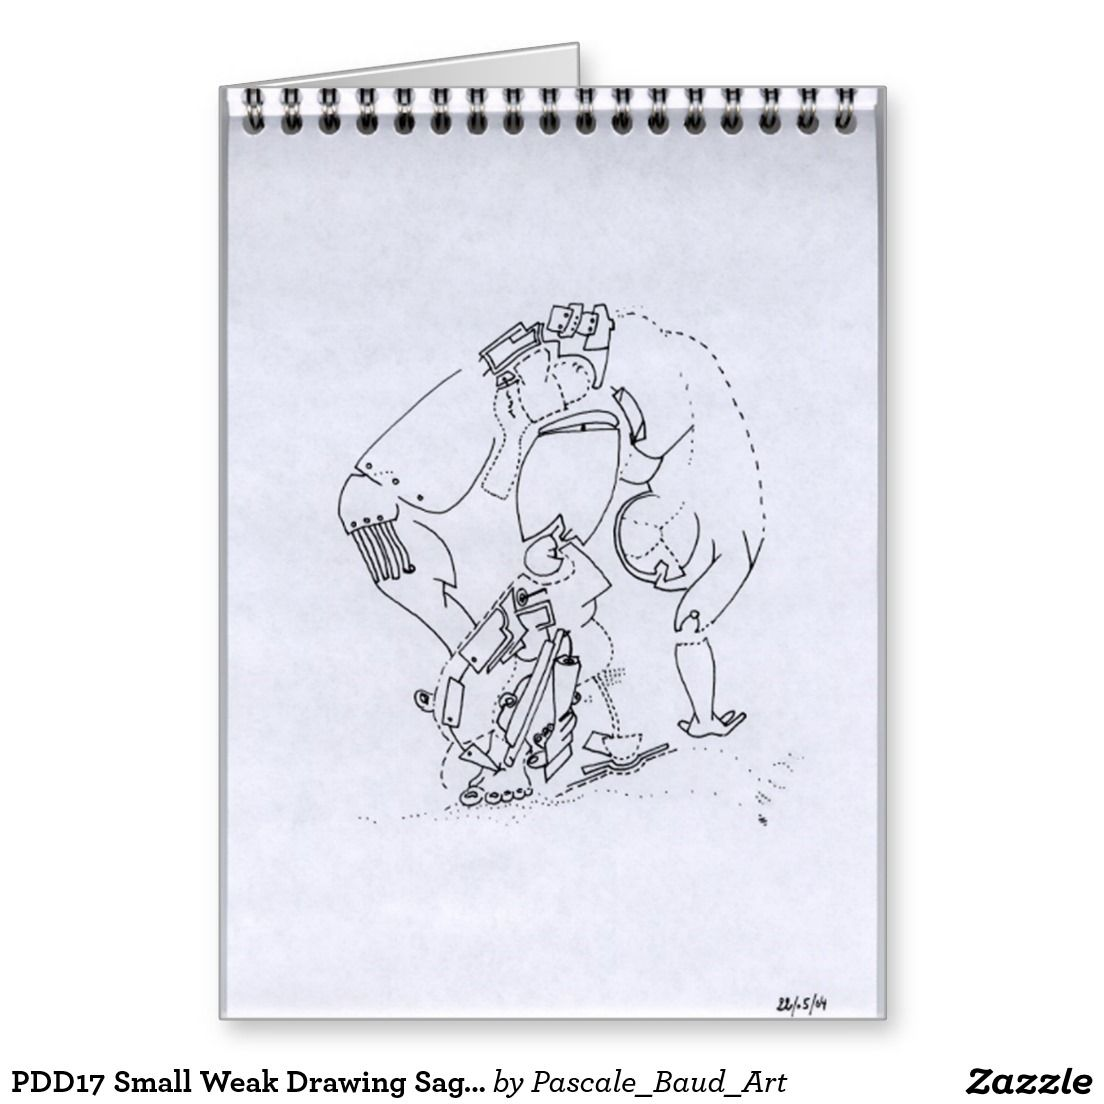 Pdd17 Small Weak Drawing Sagging Cyberbody Doodles Pinterest